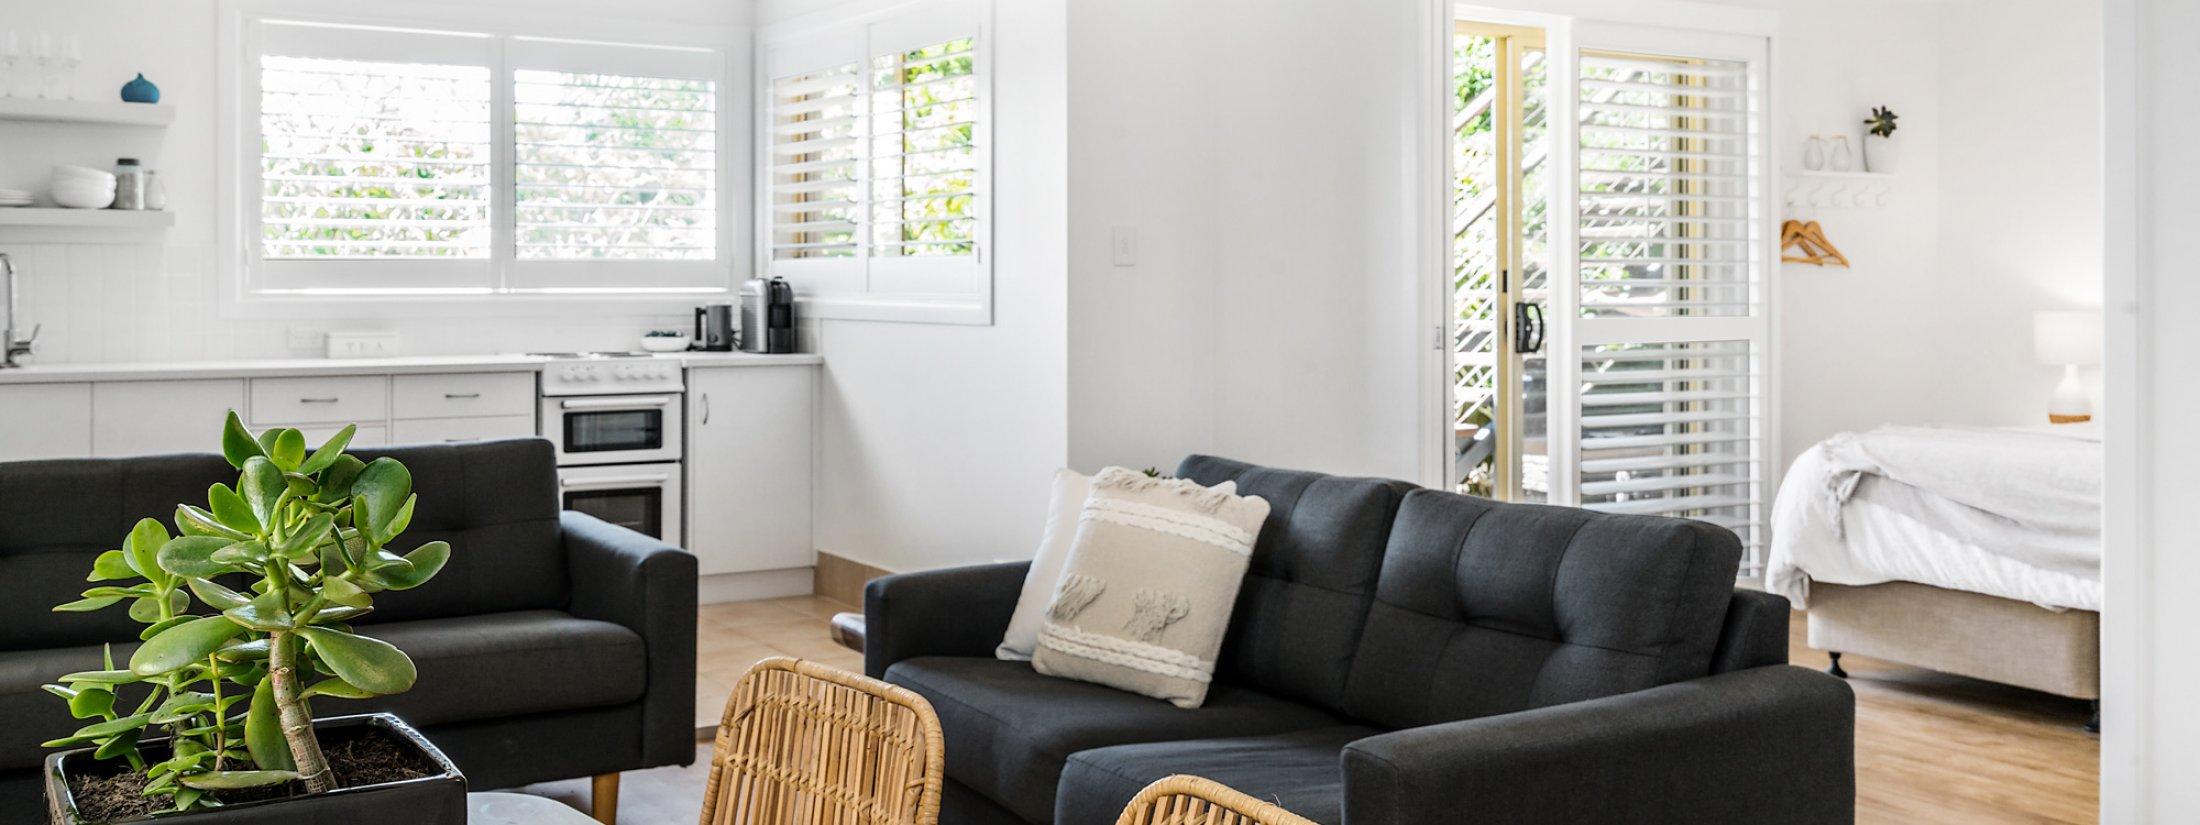 Boulders Retreat - Lennox Head - Living Room Towards Master Bedroom